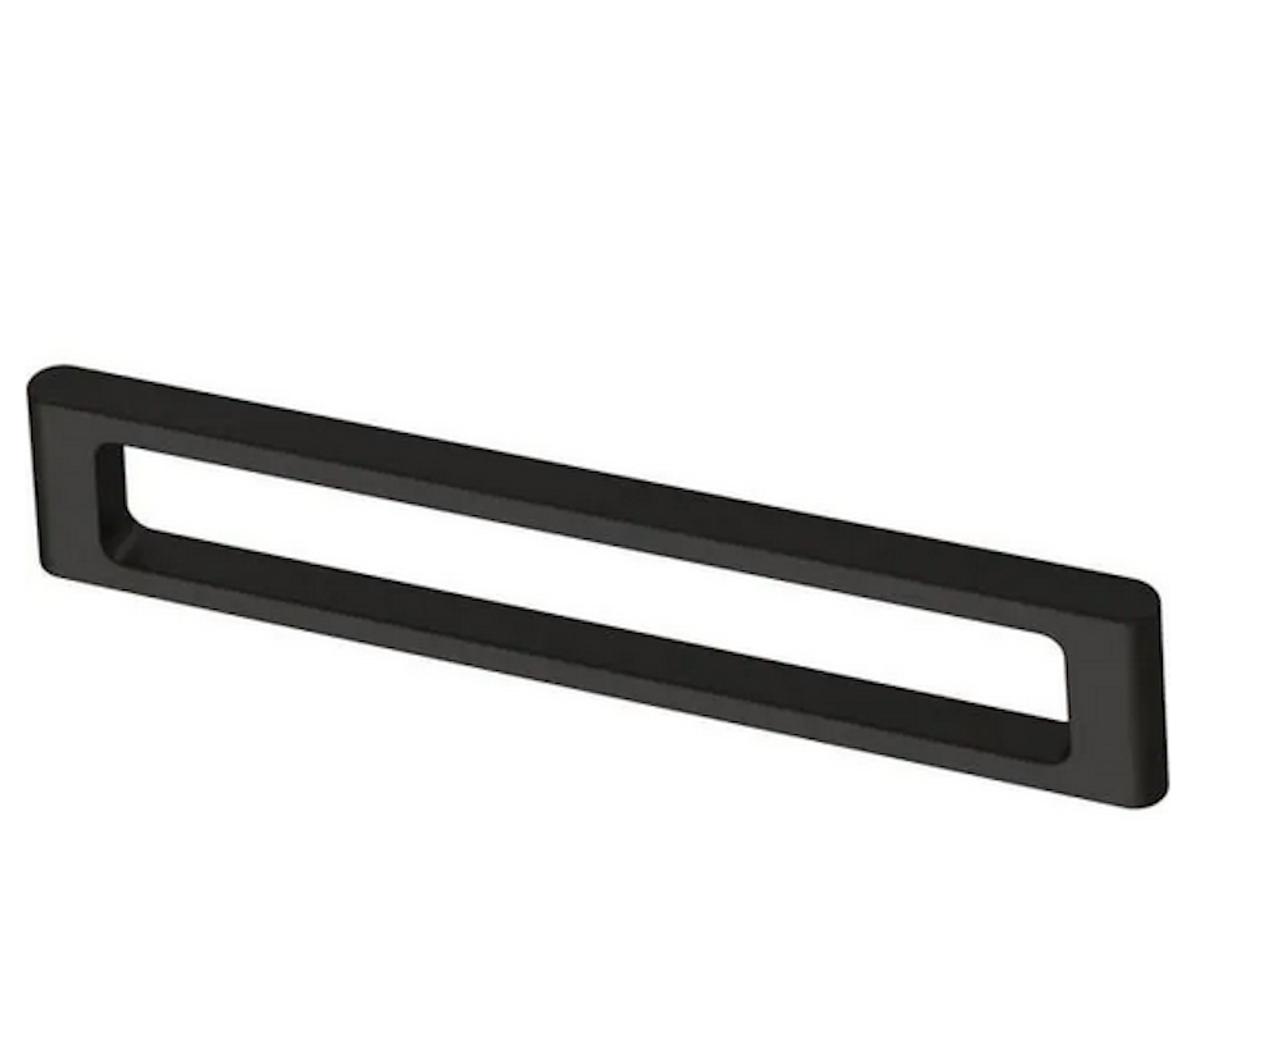 "Brainerd P40082C-FB Flat Black Squared Modern 5 1/16"" Cabinet & Drawer Pull"